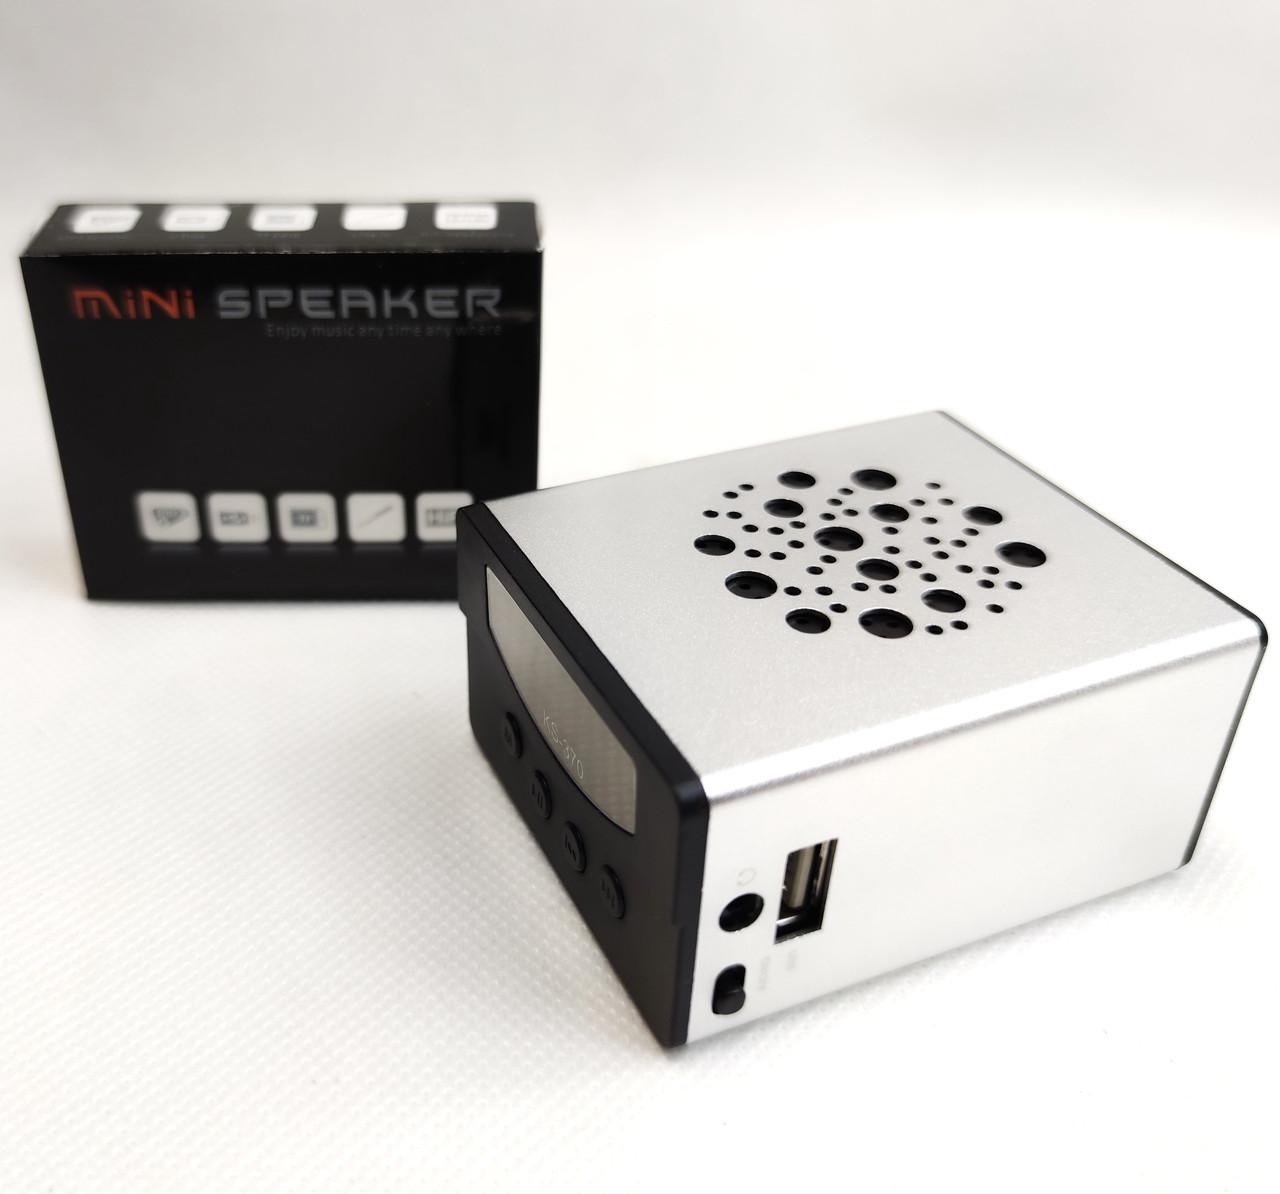 Портативная колонка акустика для телефона мини с флешкой радио серебро KS370